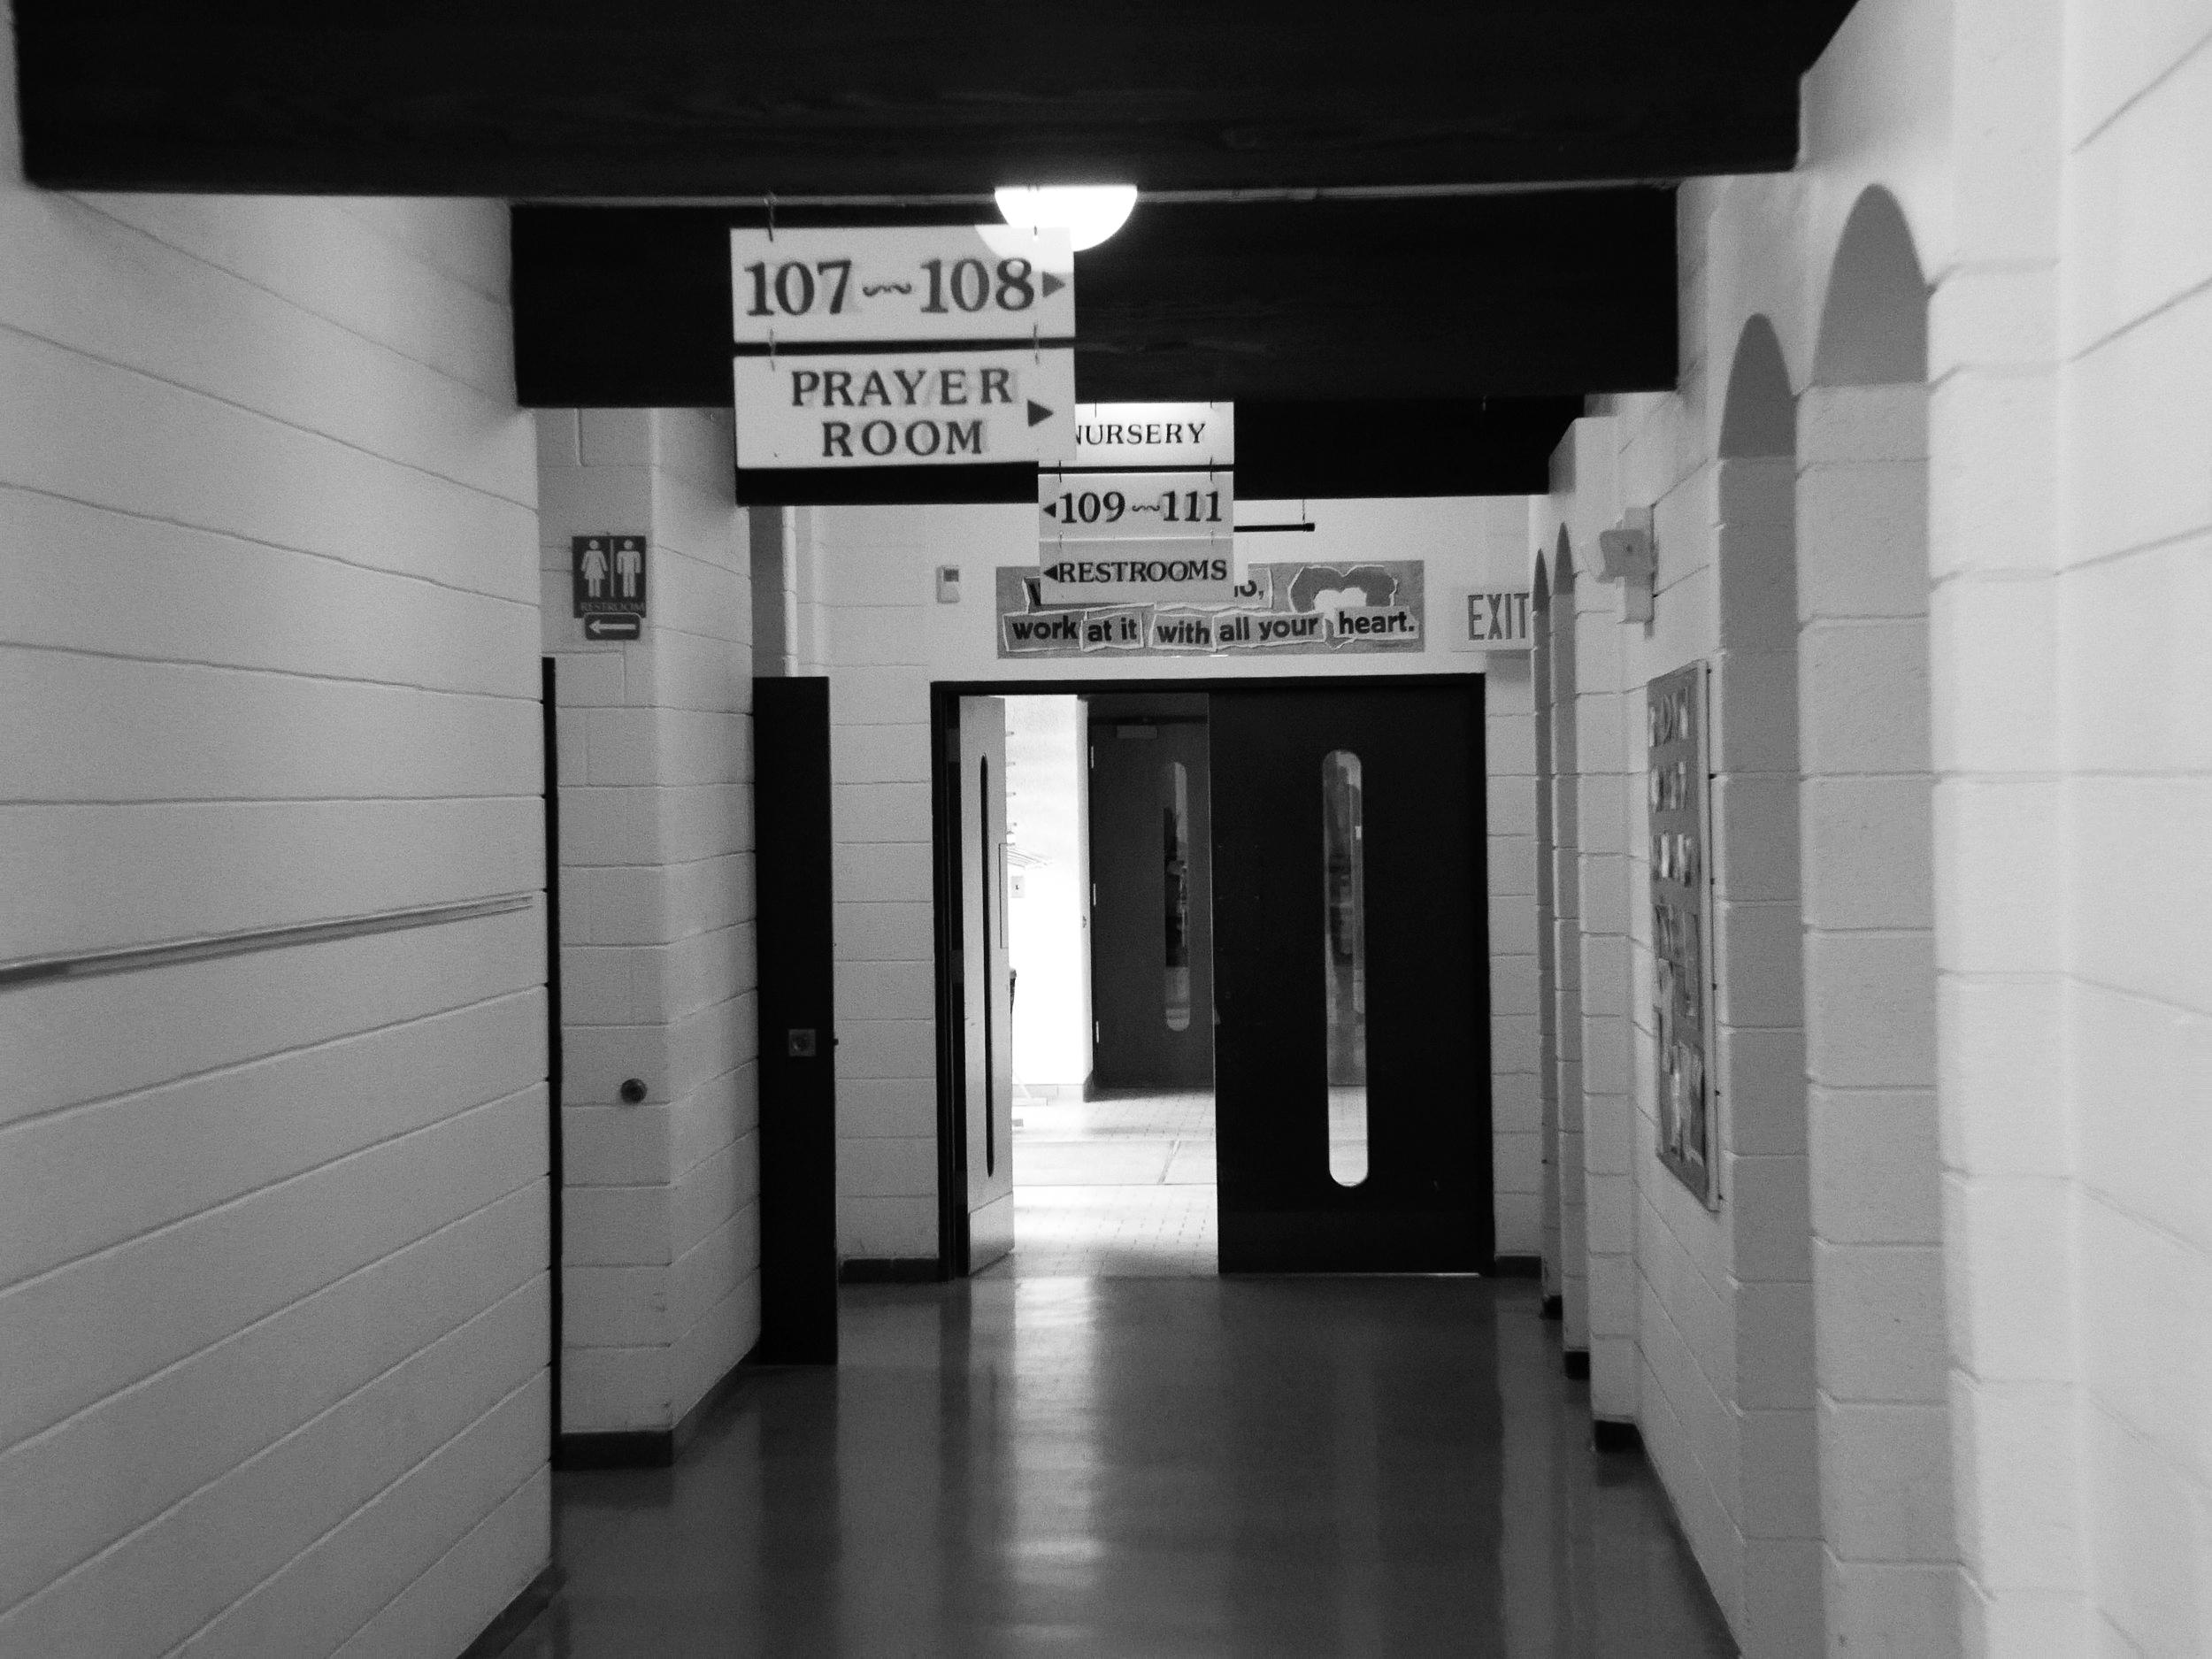 Class room Hallway